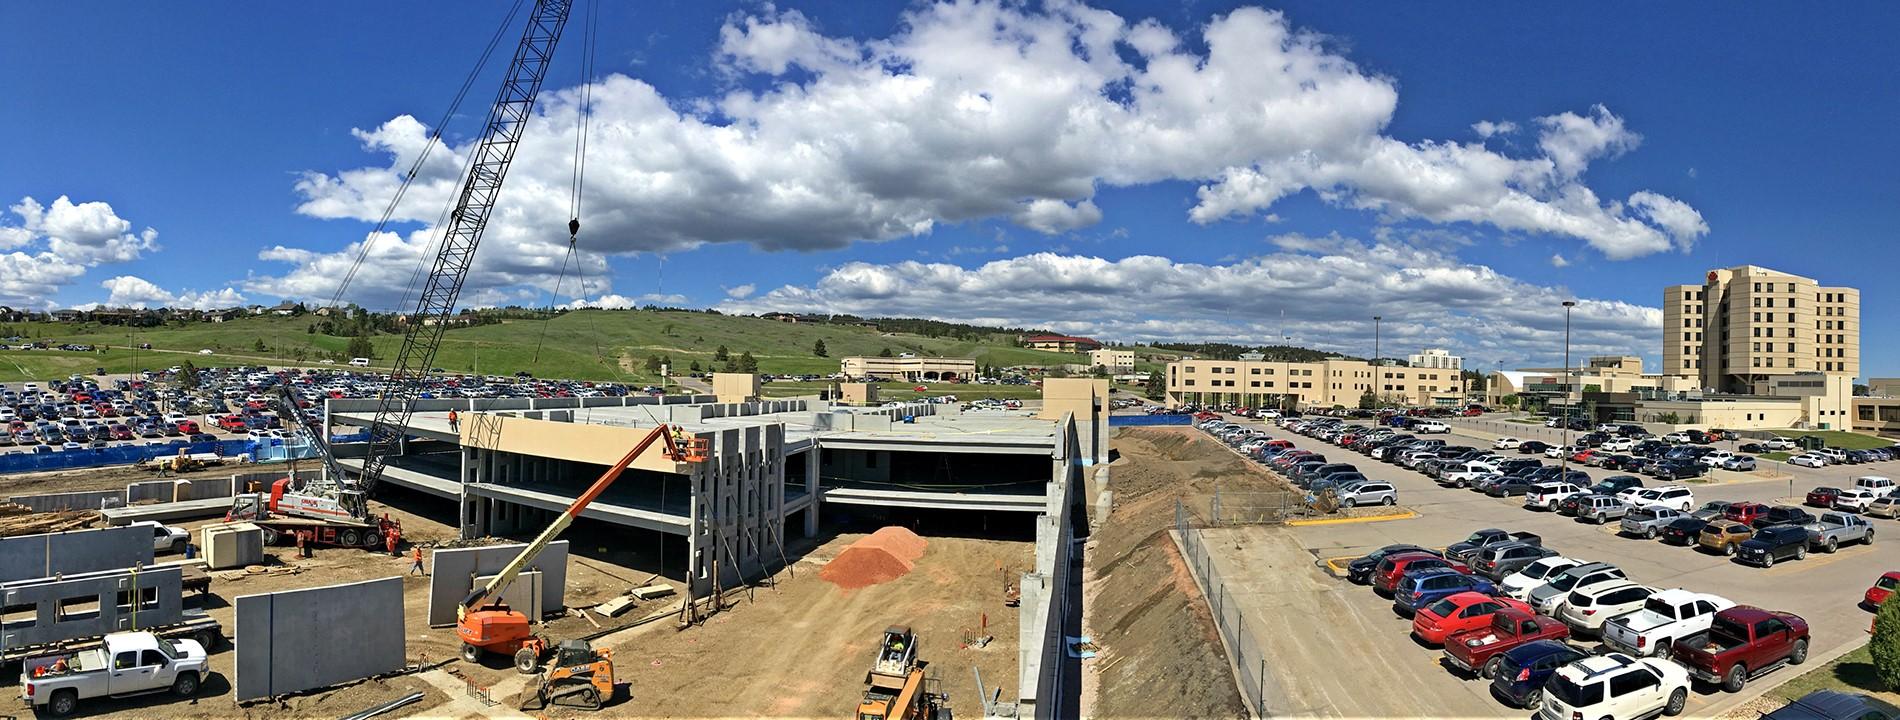 Rapid City Regional Hospital Parking Structure